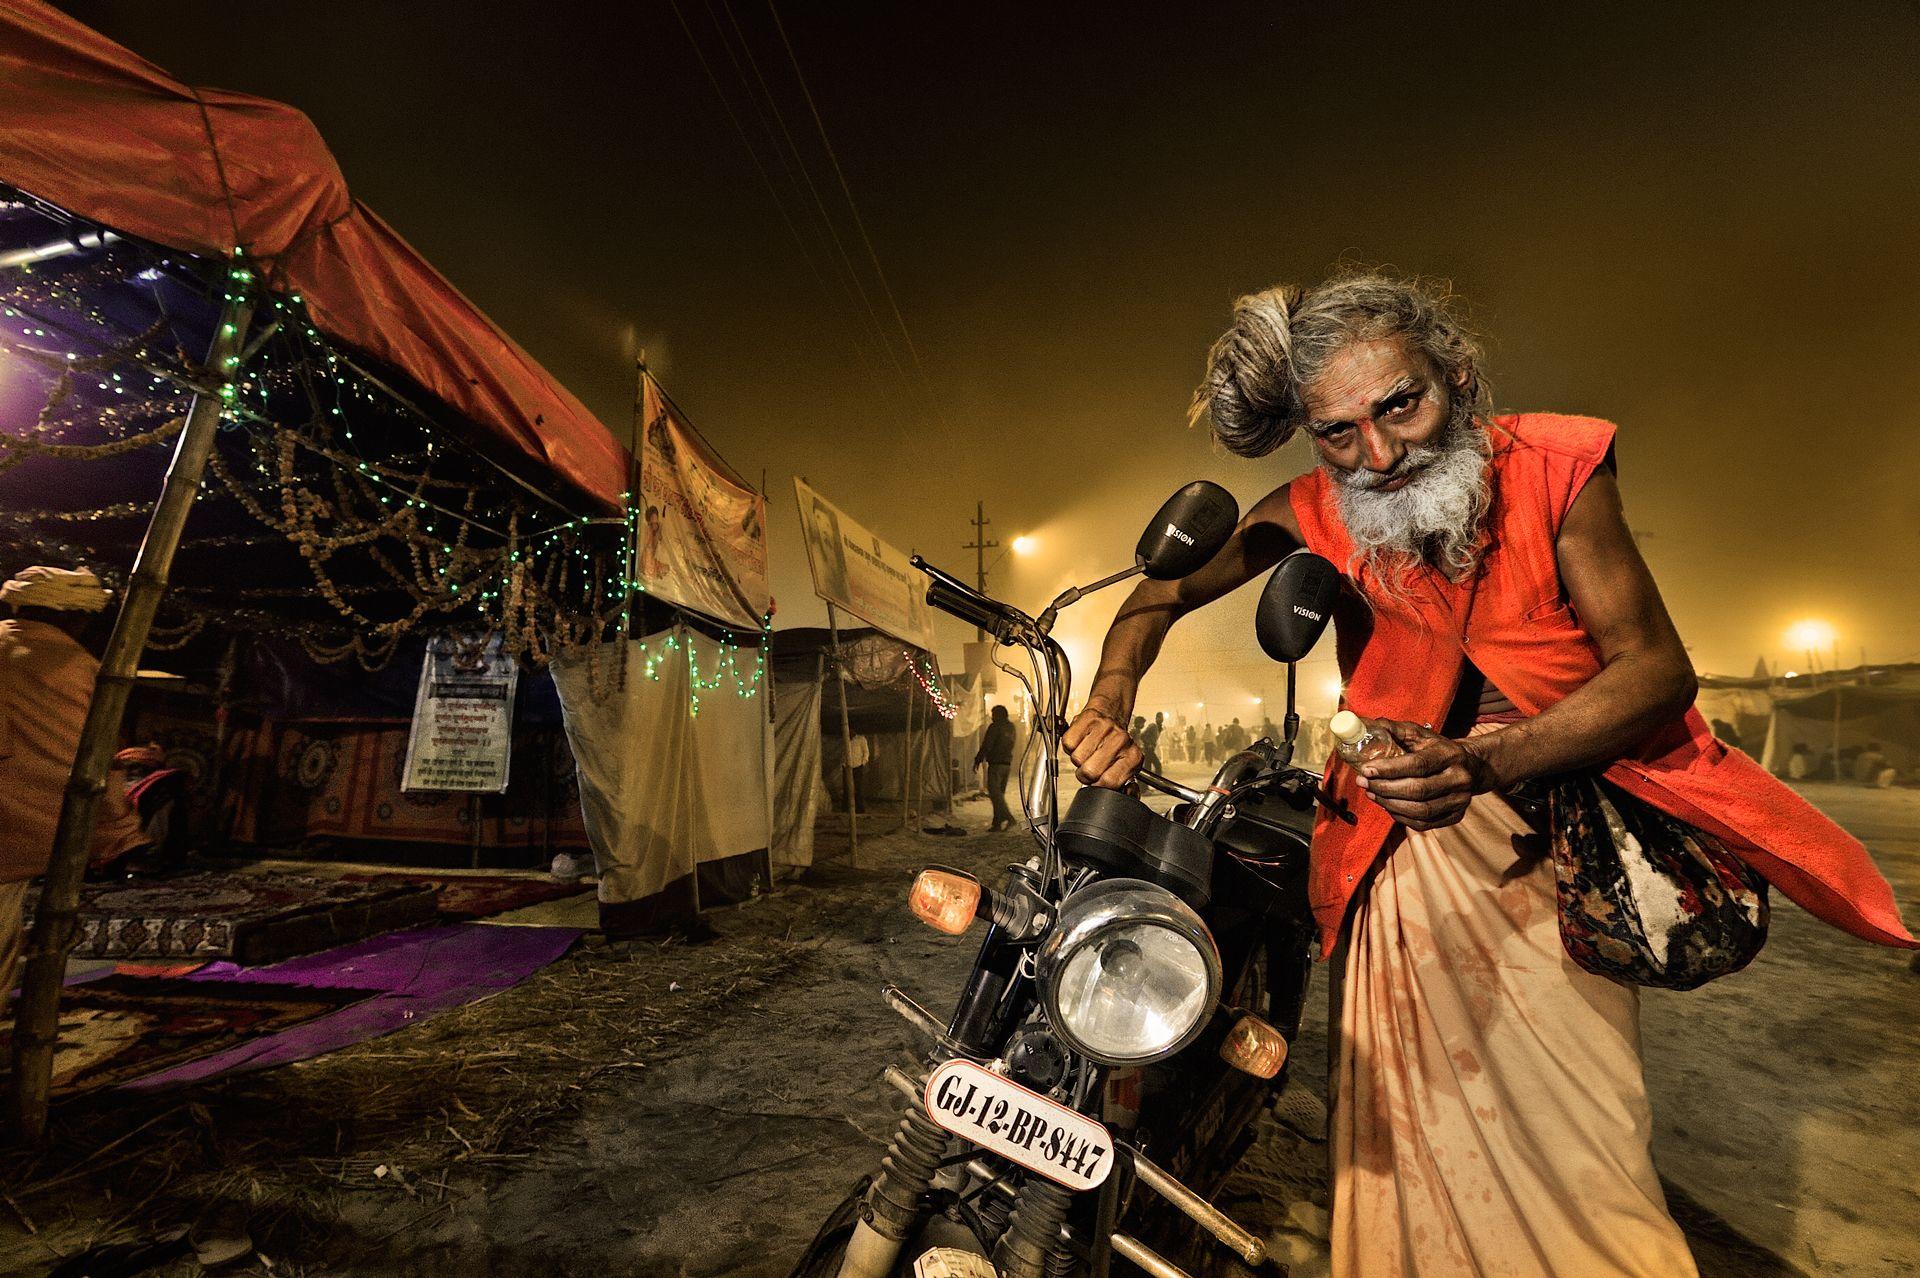 Sadhu and his motorbike